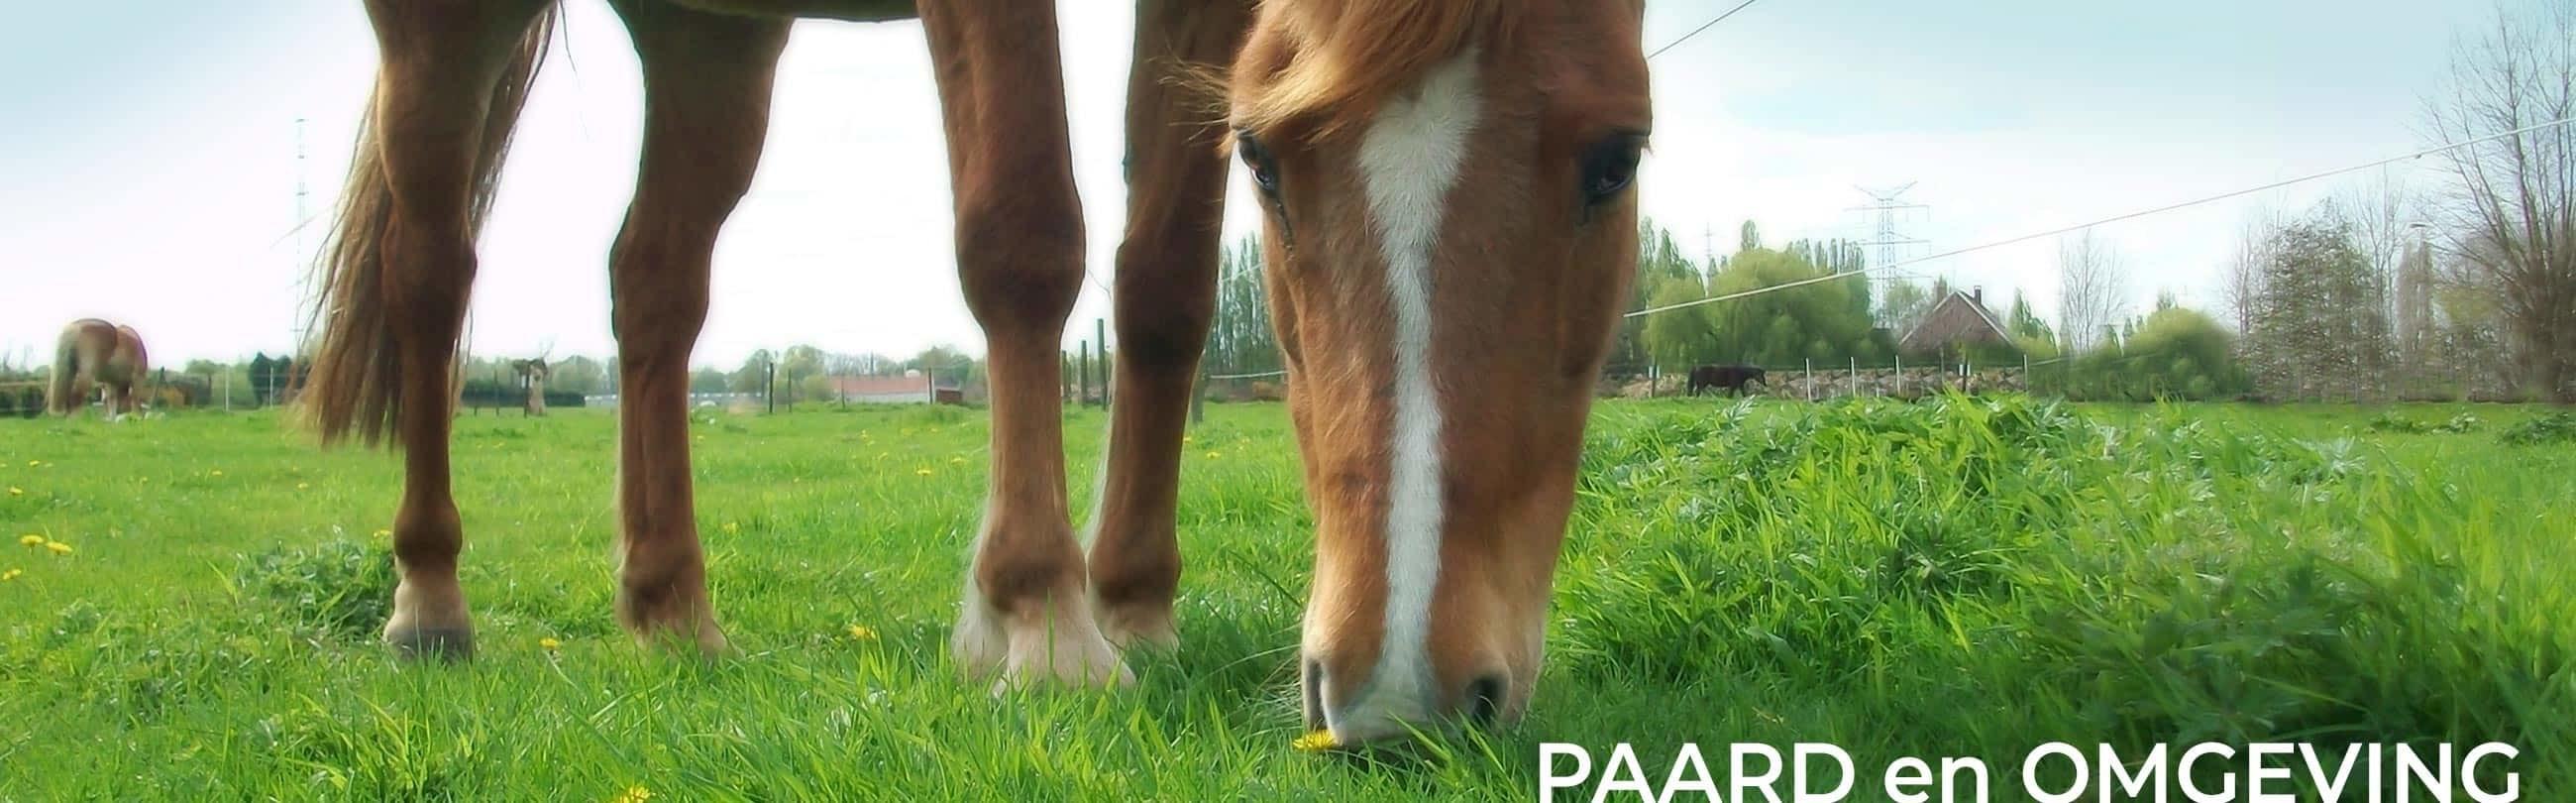 Equi Source paard en omgeving